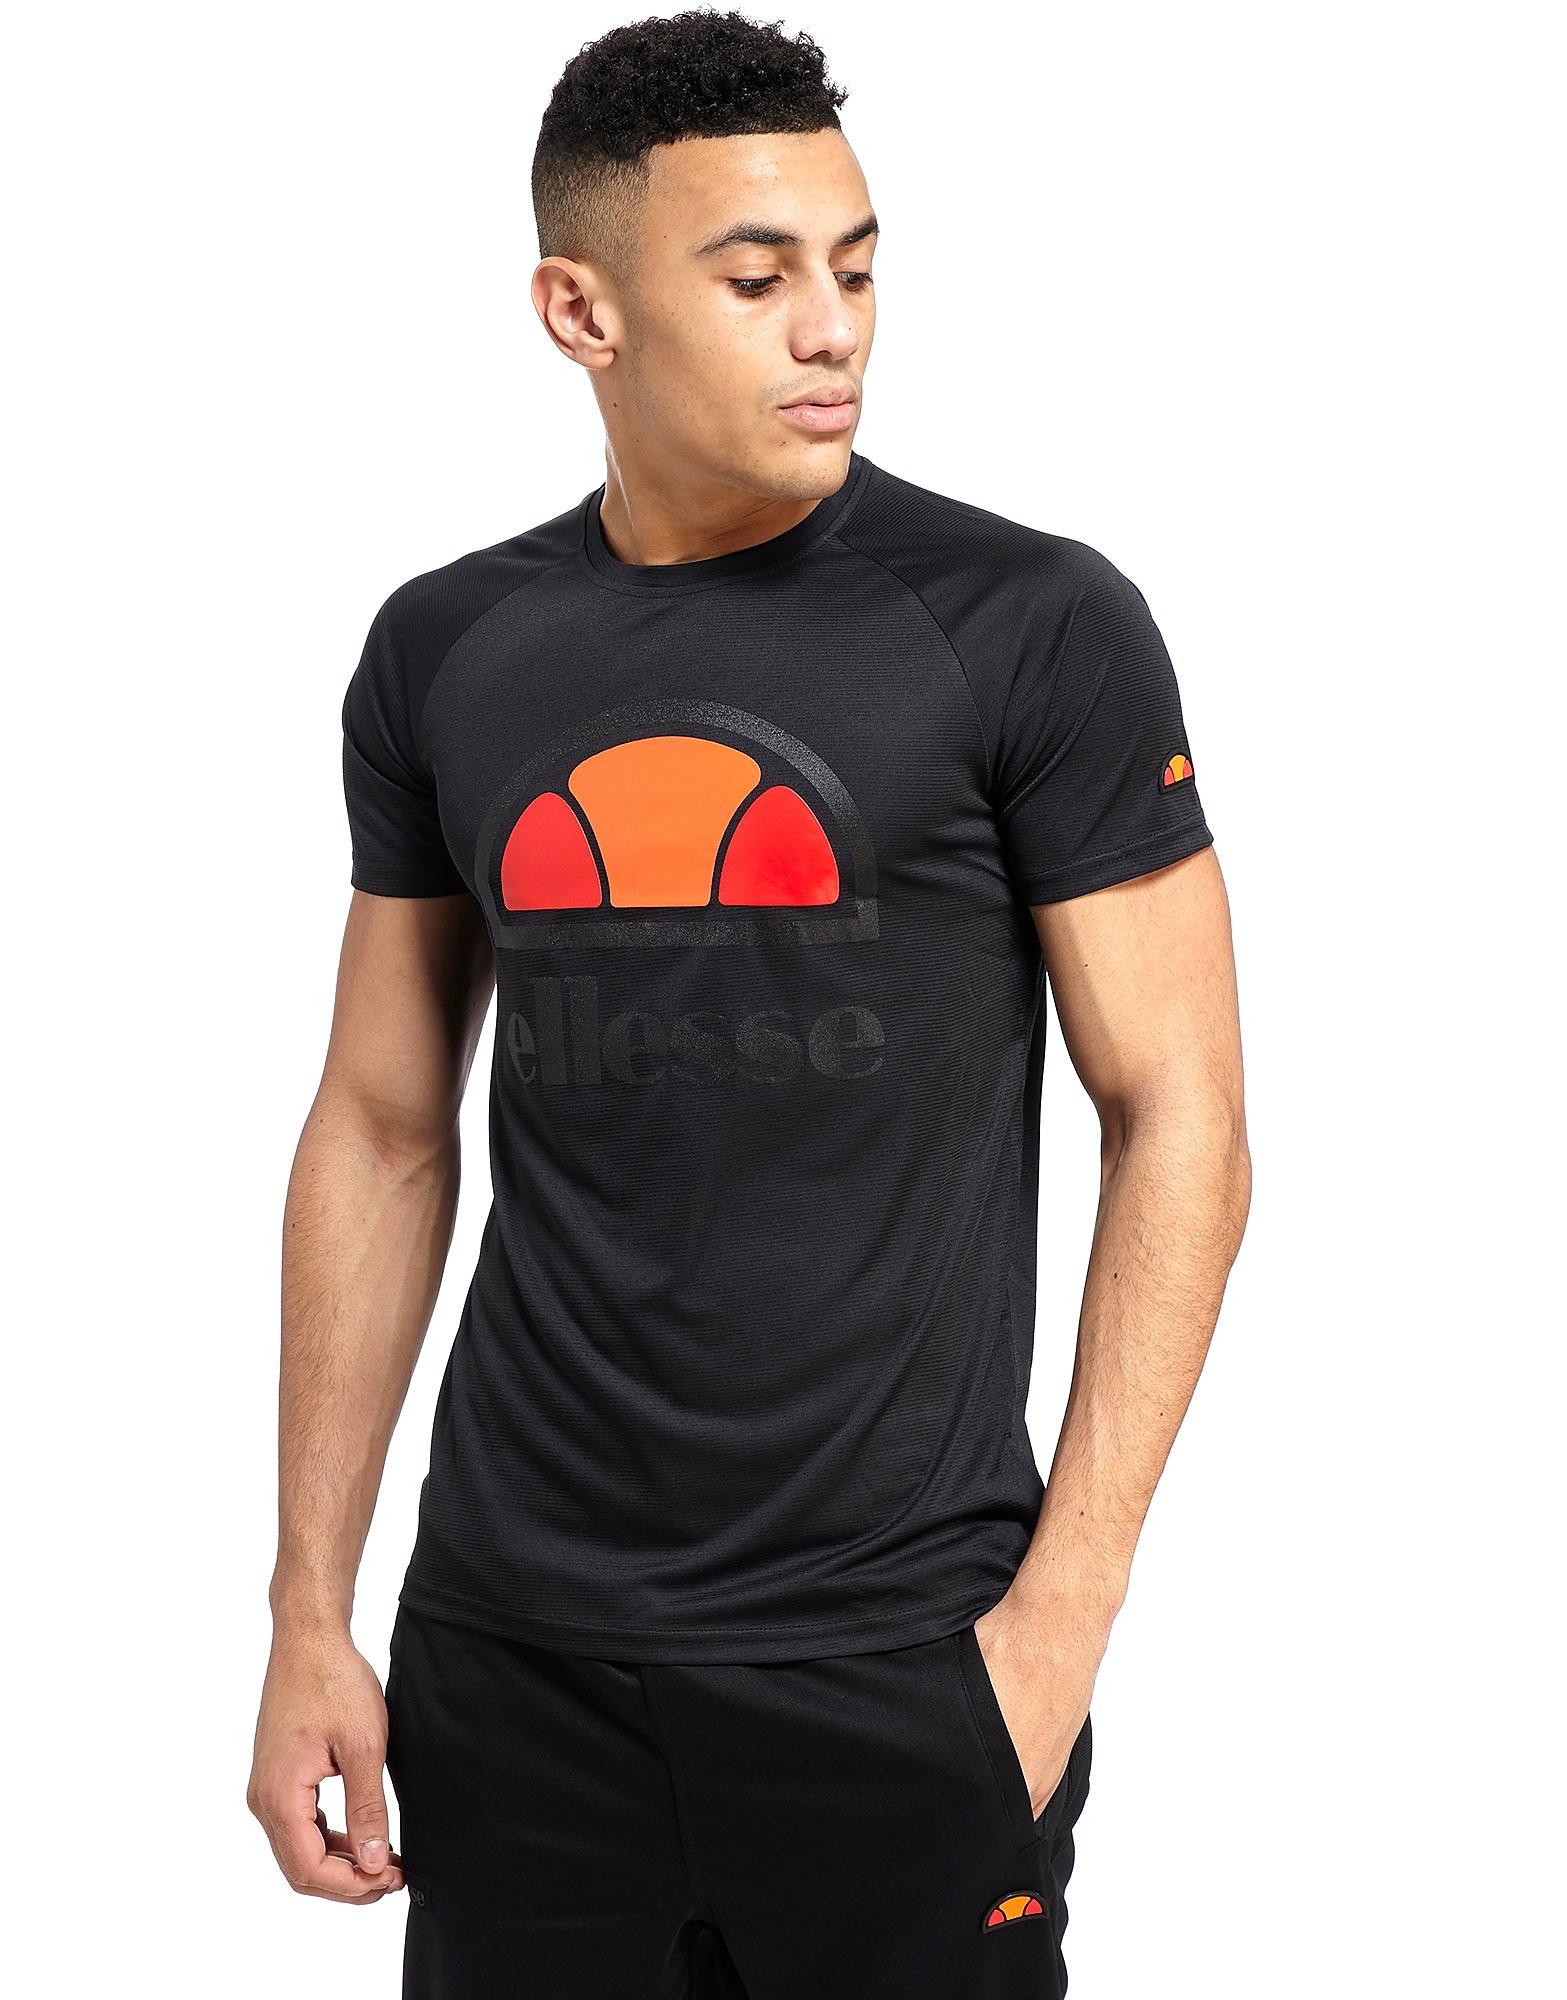 Ellesse Ruona T-Shirt Heren